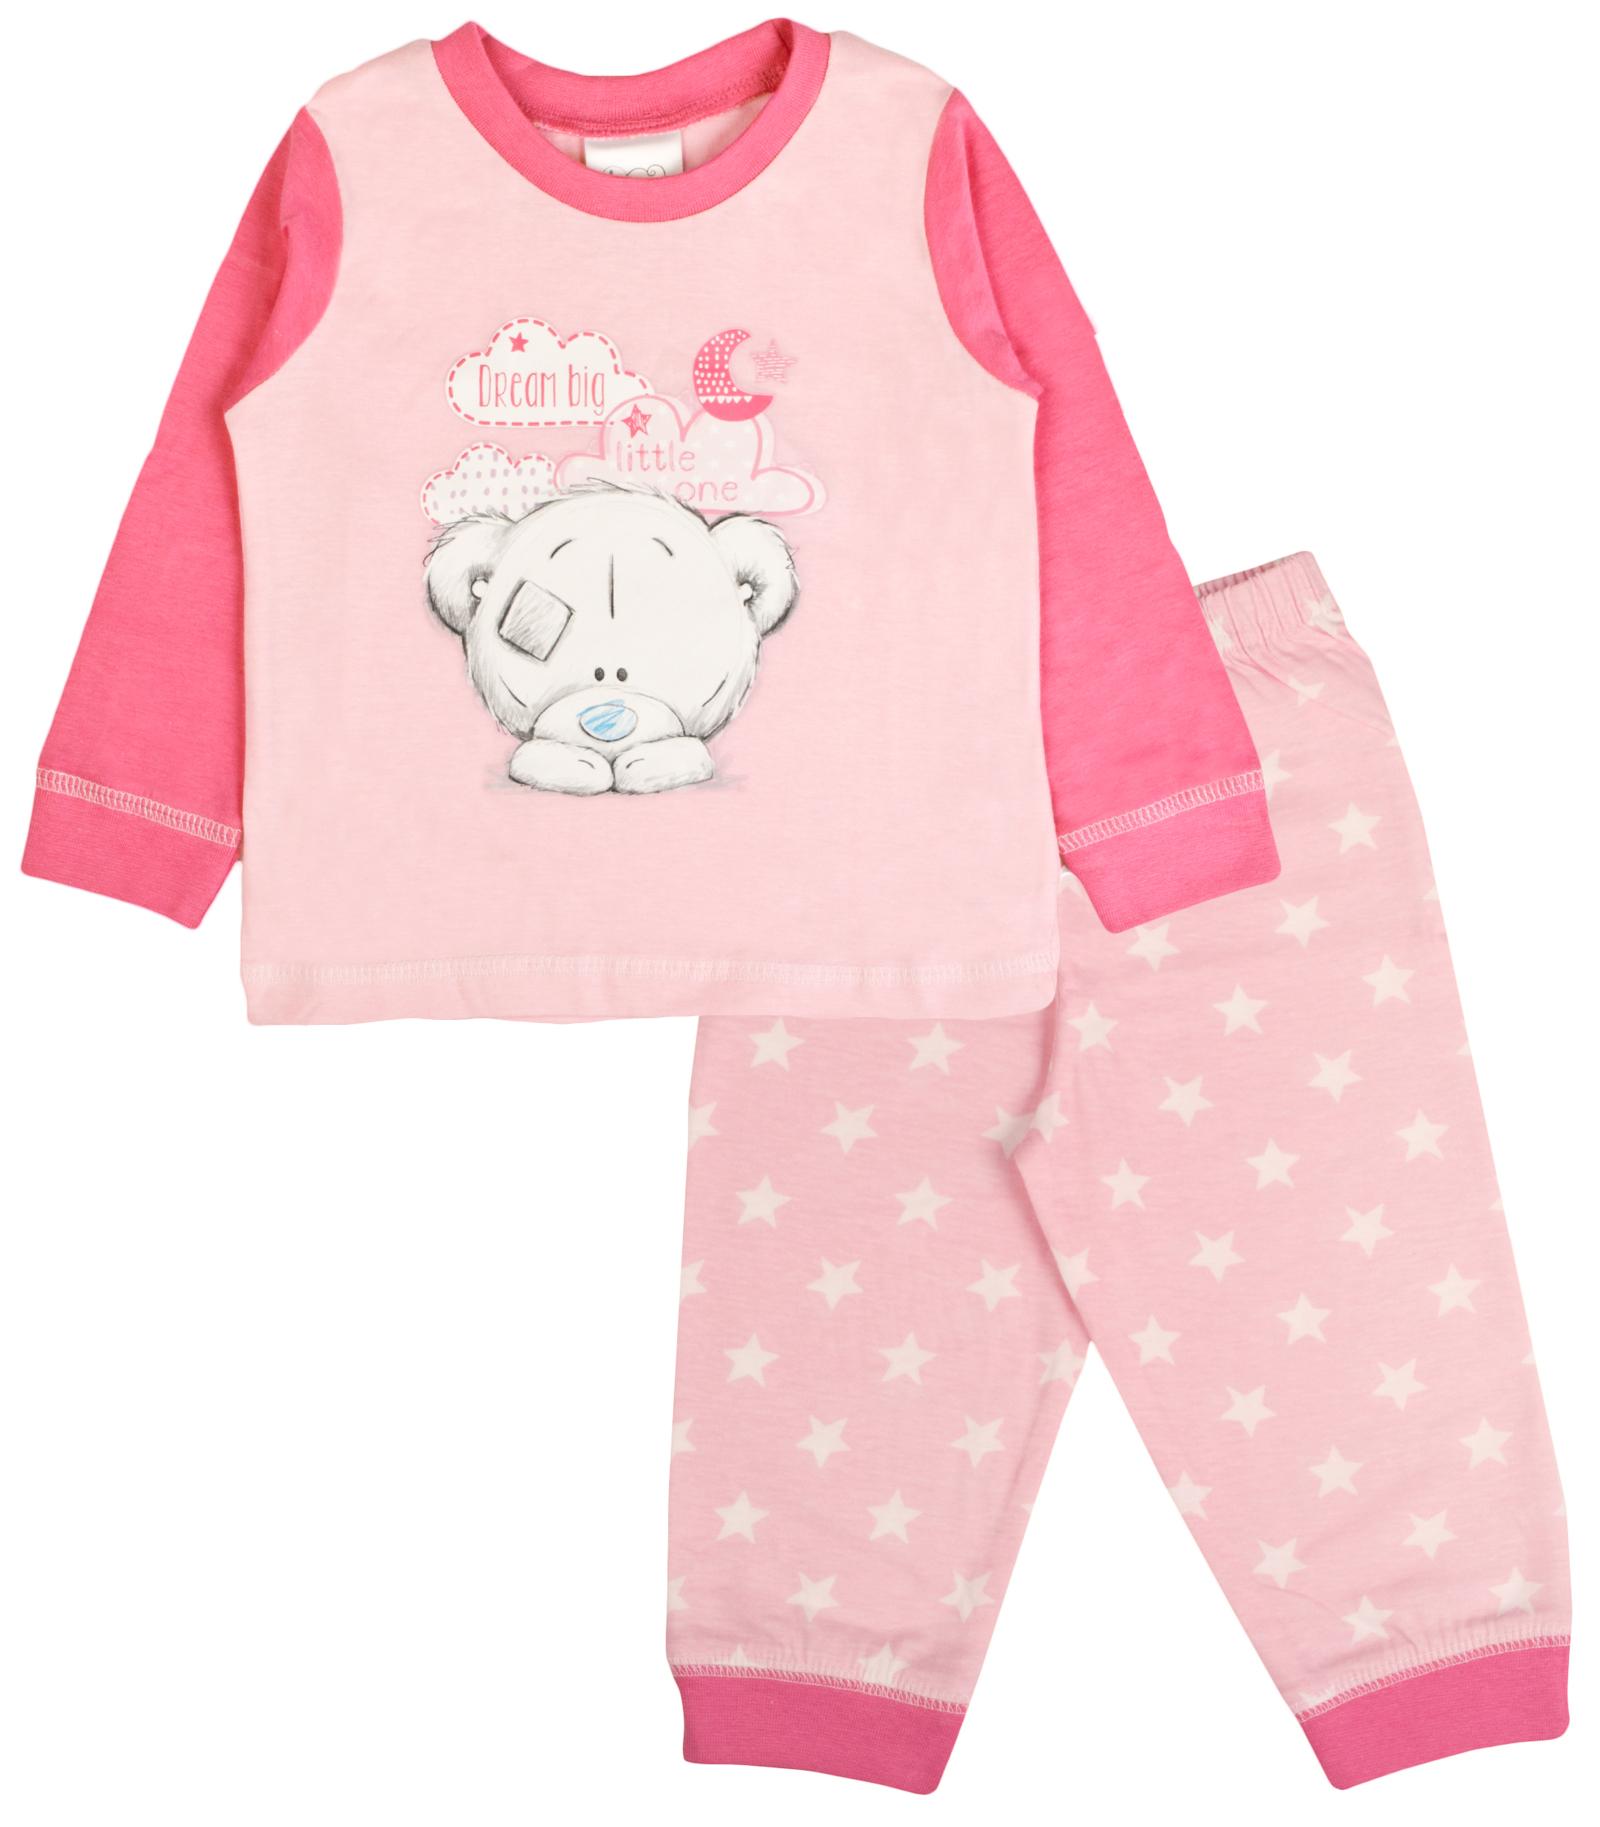 Baby Girls Pyjamas Kids Toddlers Me To You Pjs Cute Tatty ...